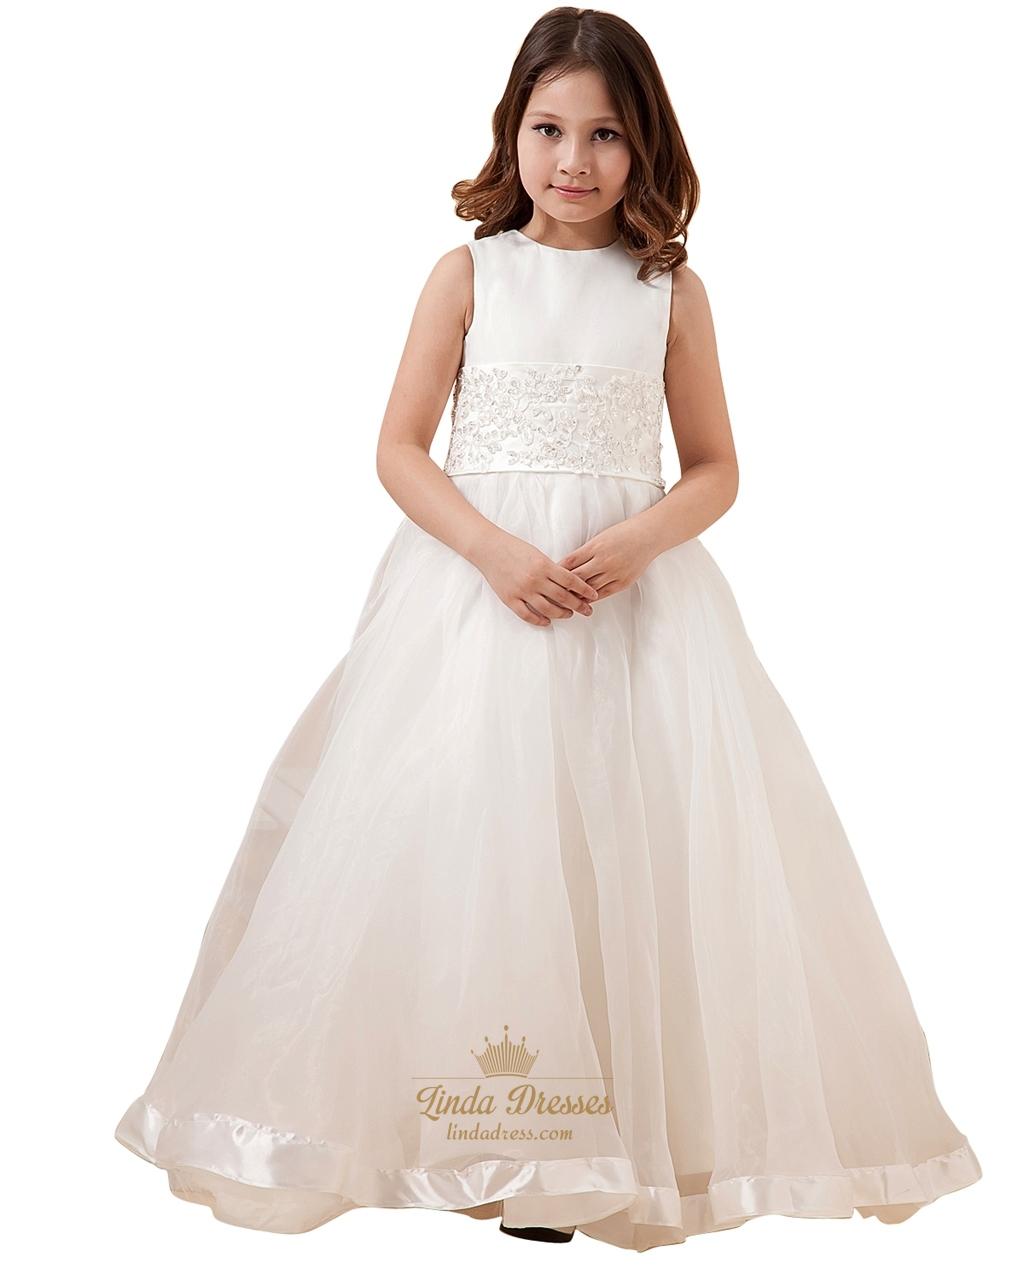 b004b844d09 Ivory A Line Organza Floor Length Flower Girl Dresses With Applique SKU  -W037